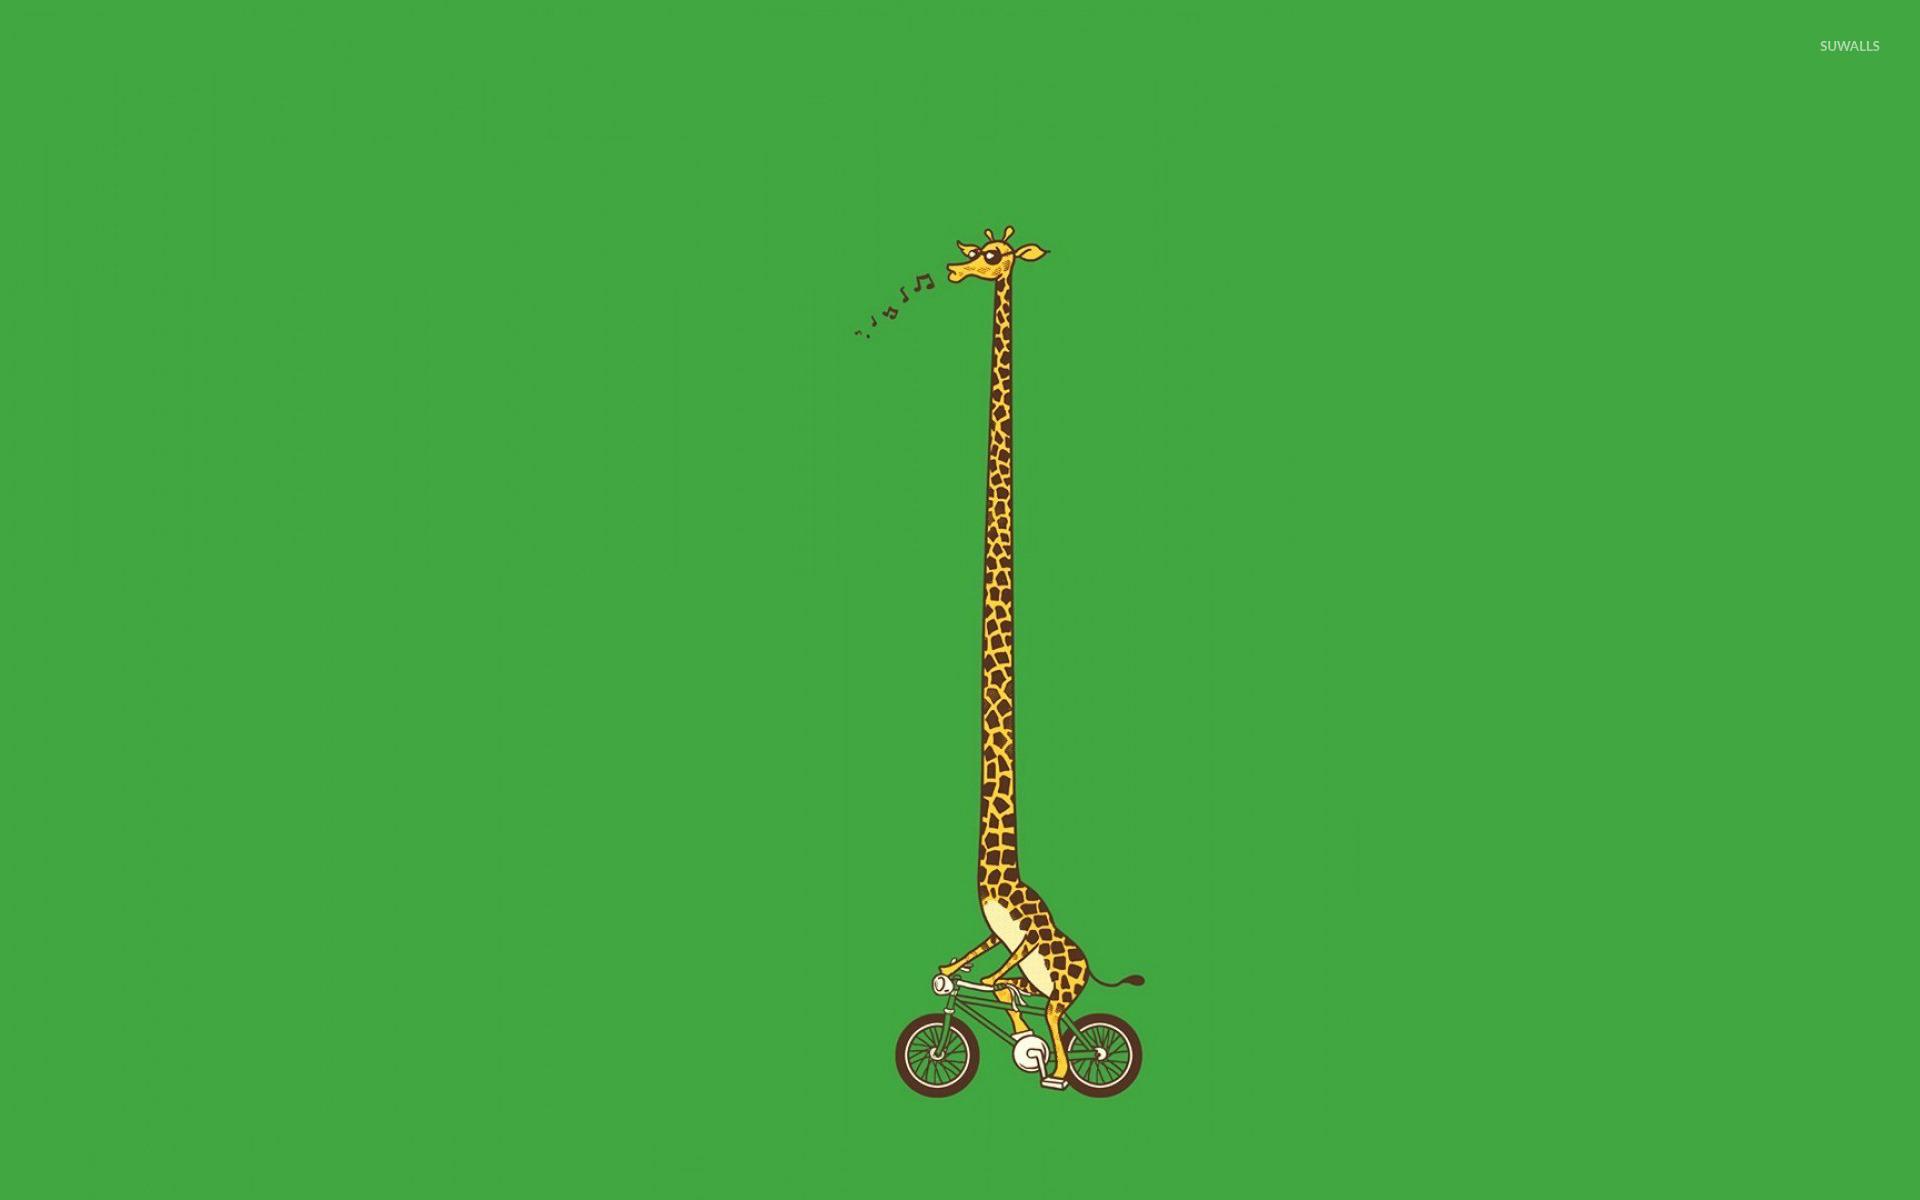 Biking Giraffe Wallpaper